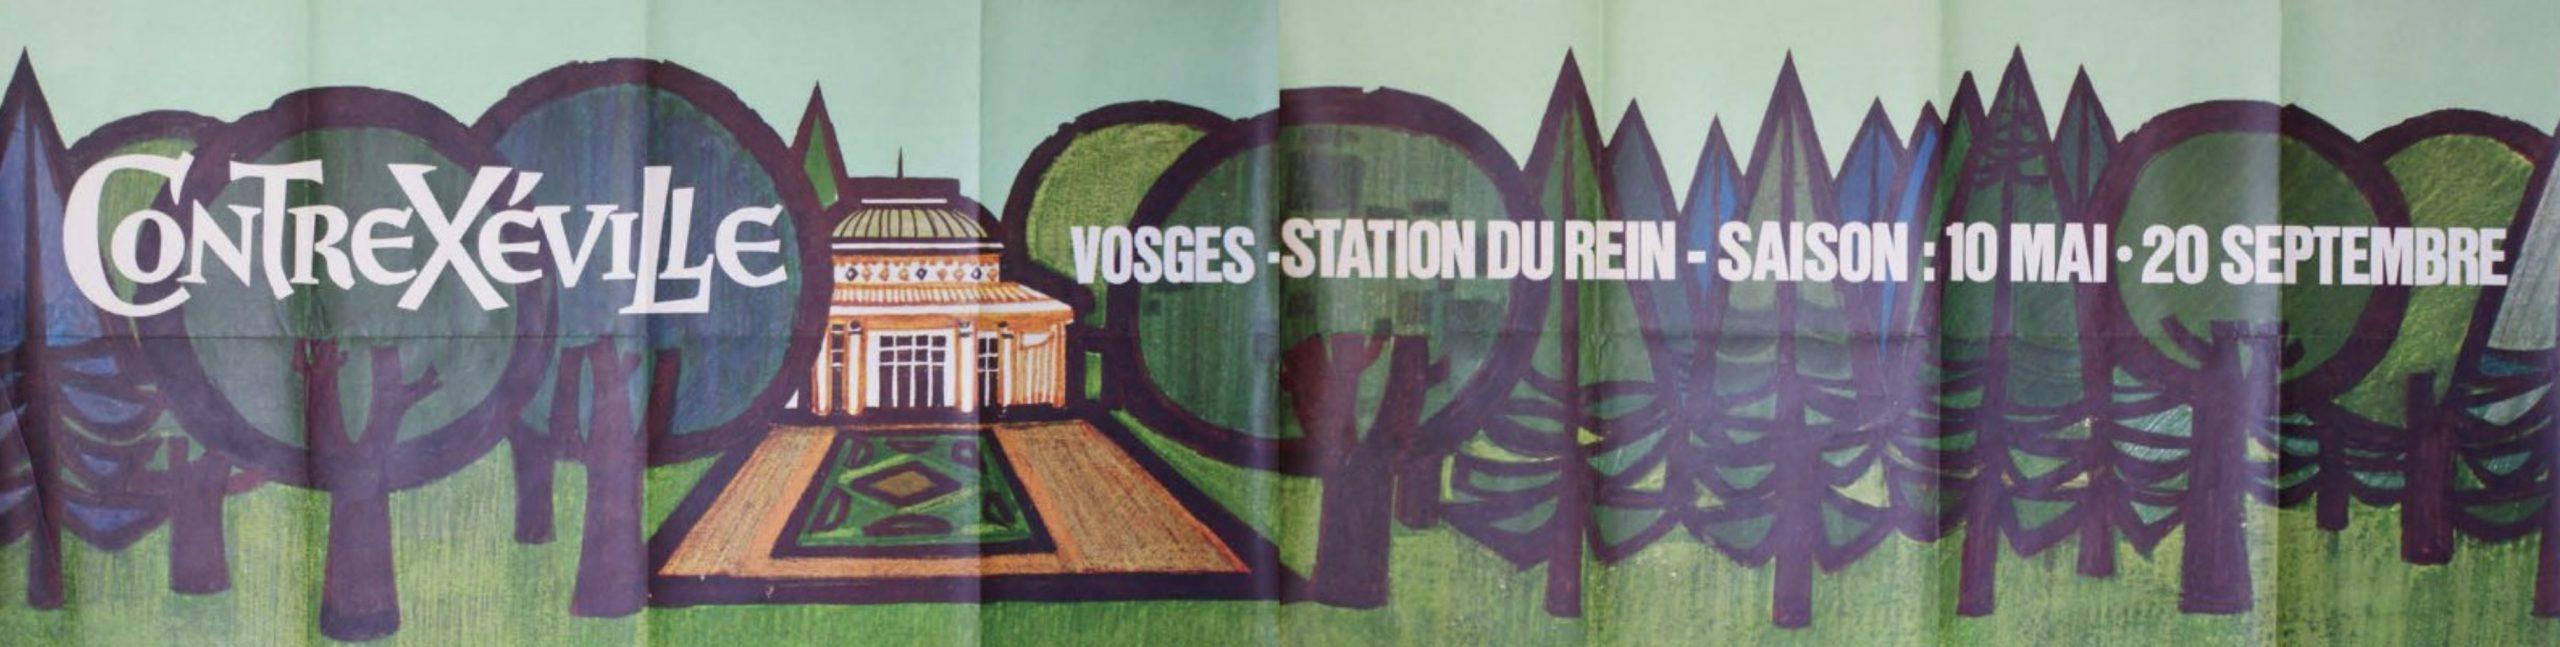 CONTREXÉVILLE 'Vosges Station Du Rein' Original Vintage Poster